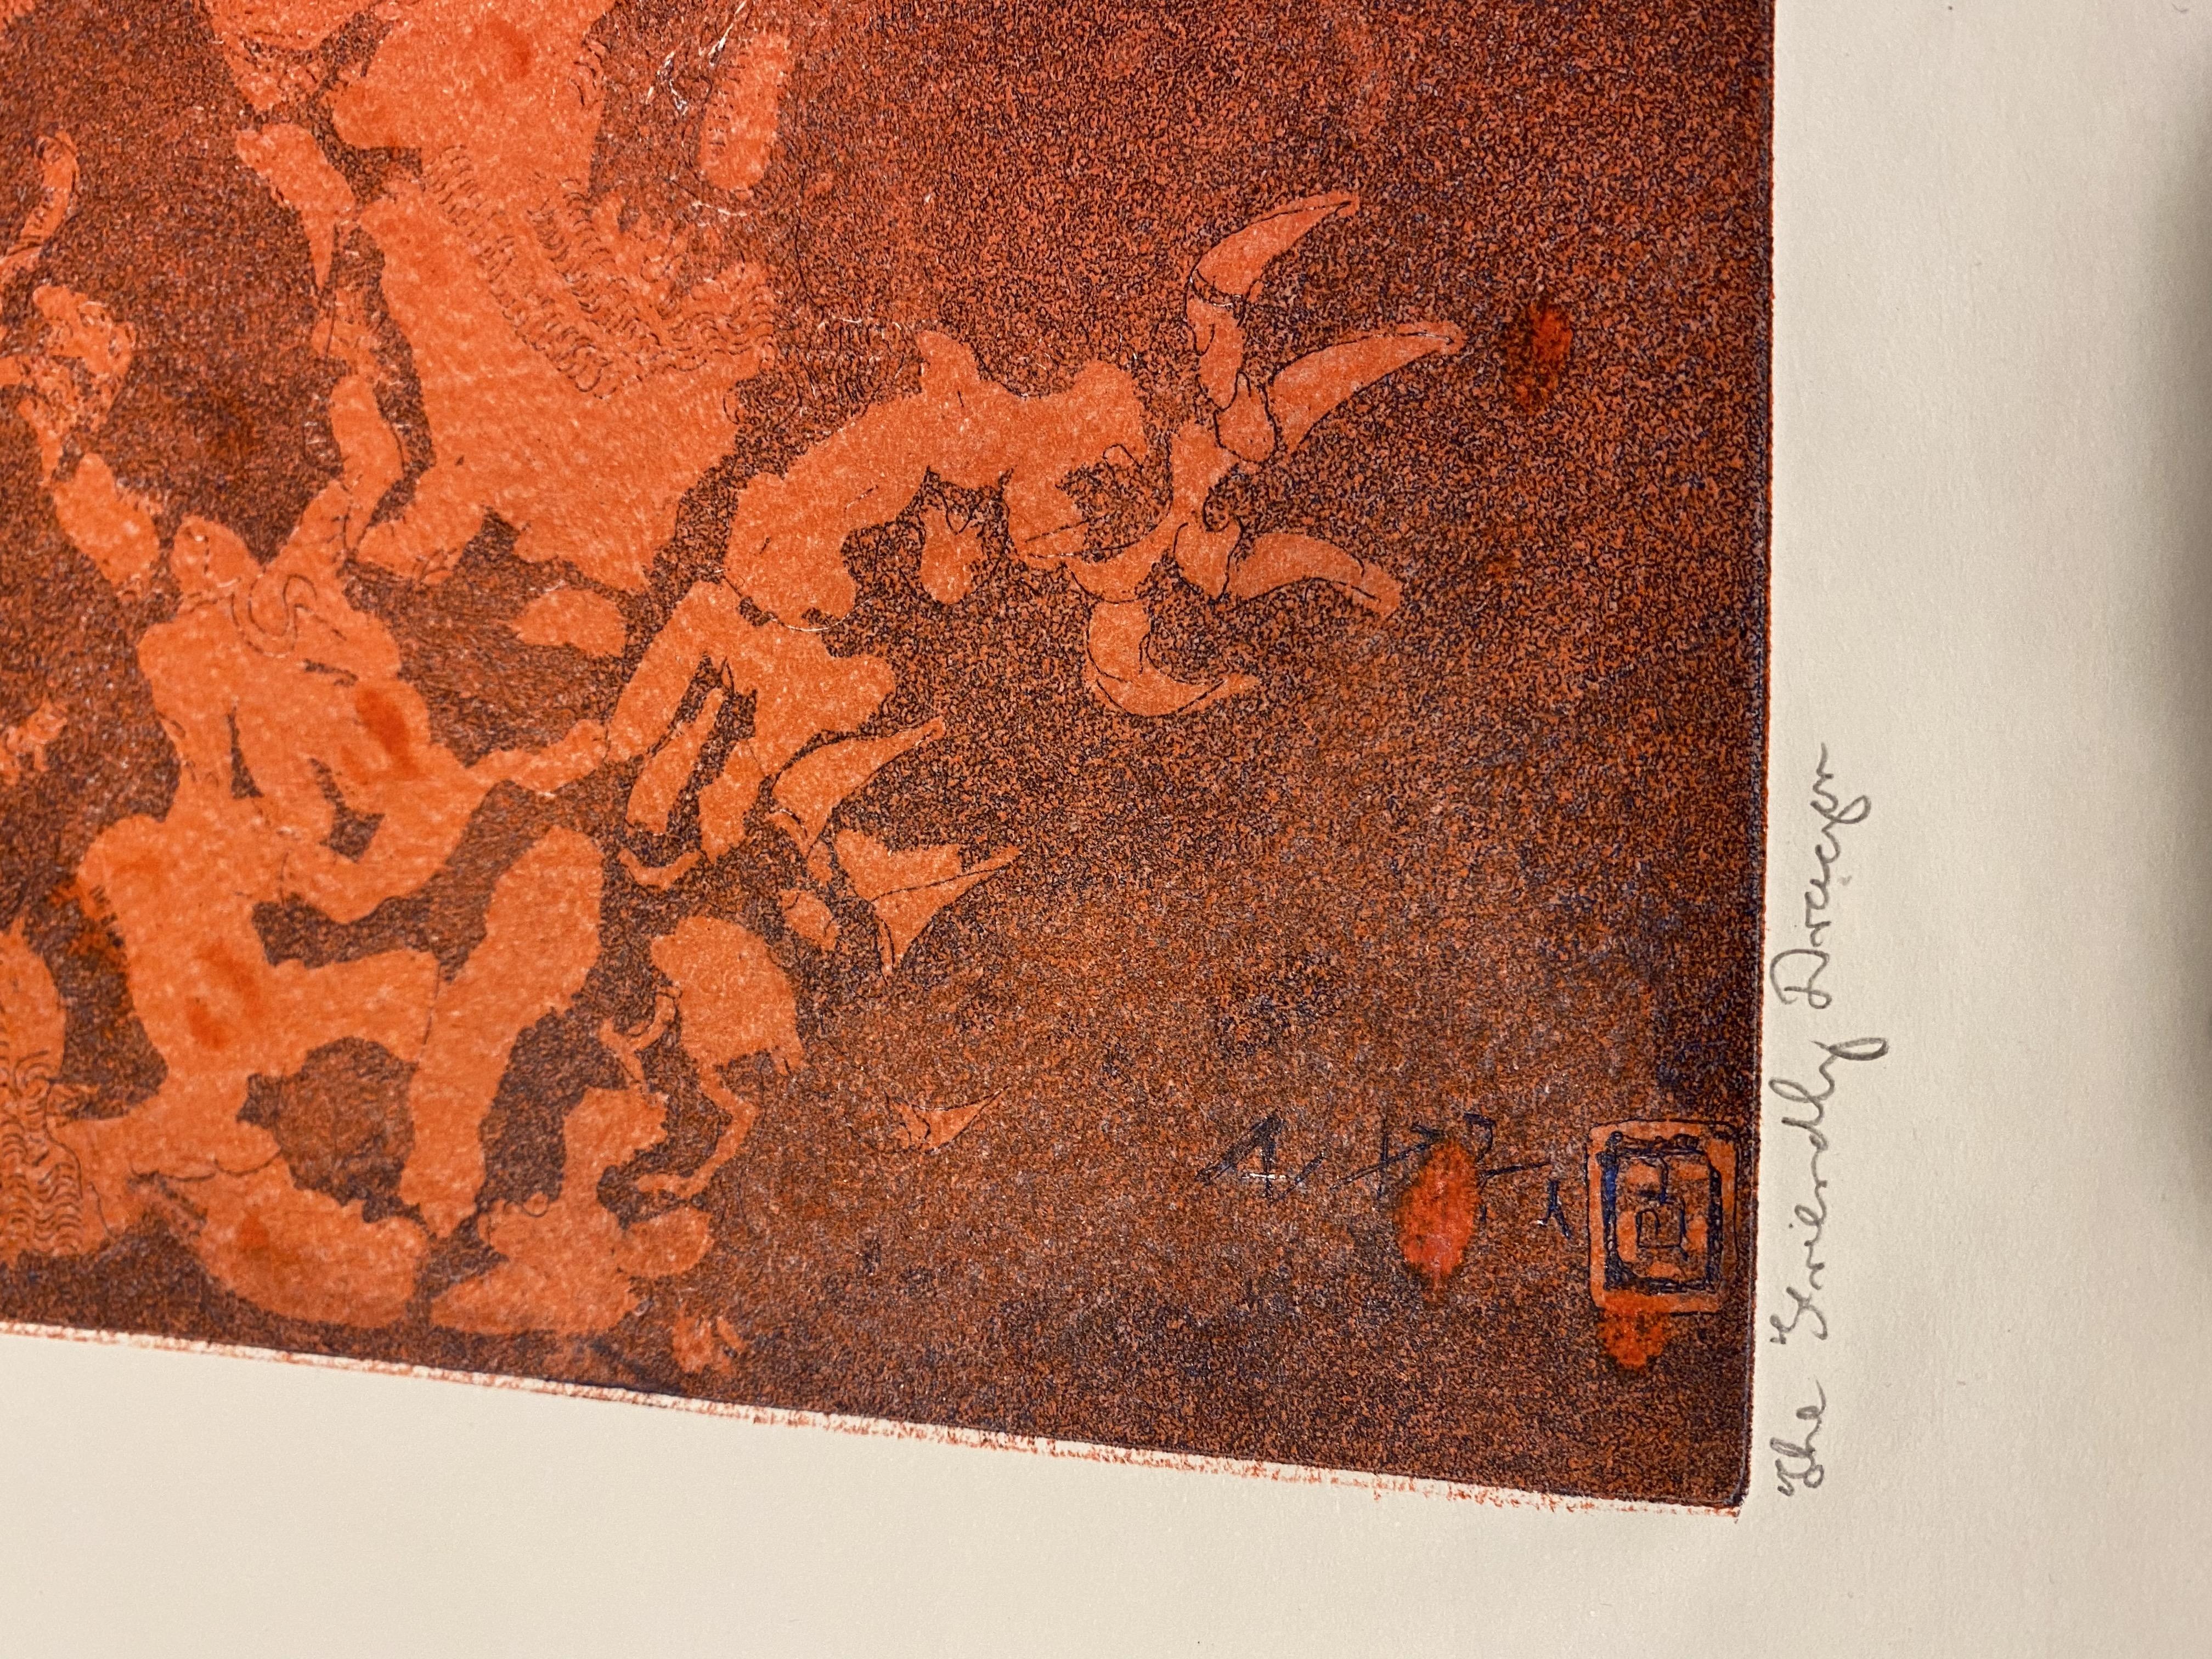 Samuel Robin Spark, The Friendly Dragon Artist Proof Print 91/92 - Image 2 of 3